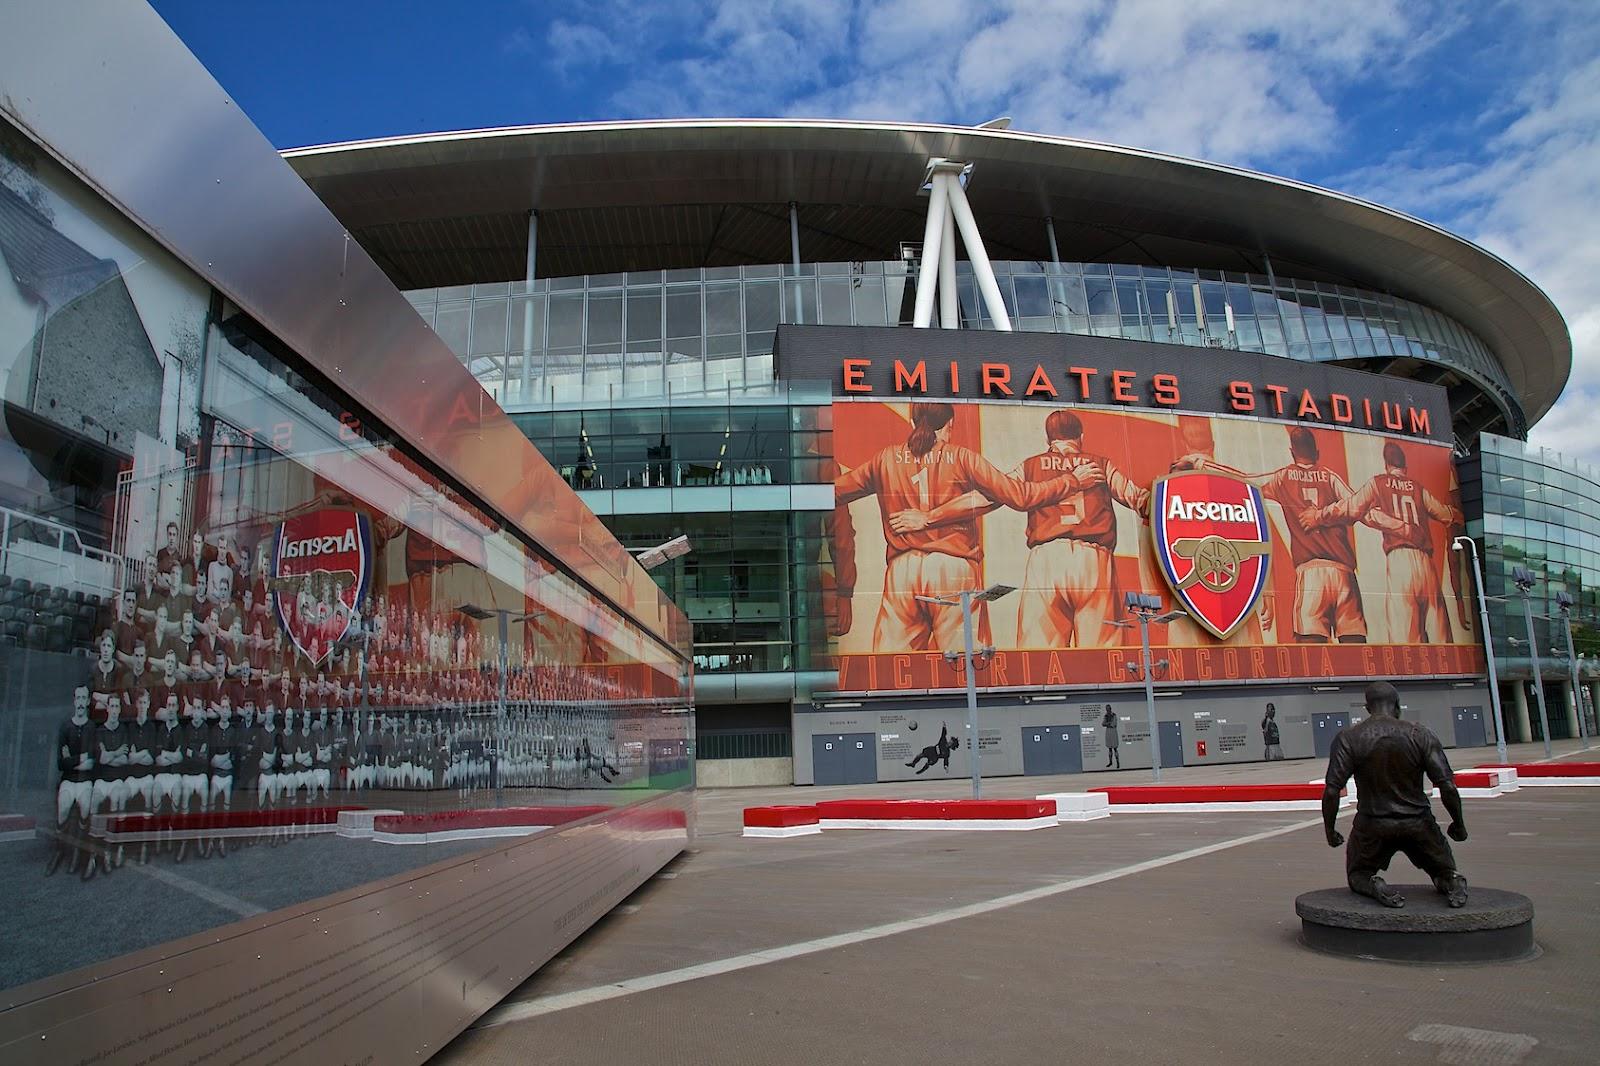 http://2.bp.blogspot.com/-my5RNPjwvR0/UAEttyInhkI/AAAAAAAAPtQ/-EFsMNoeyjM/s1600/Arsenal%252C+Emirates+Stadium.jpg